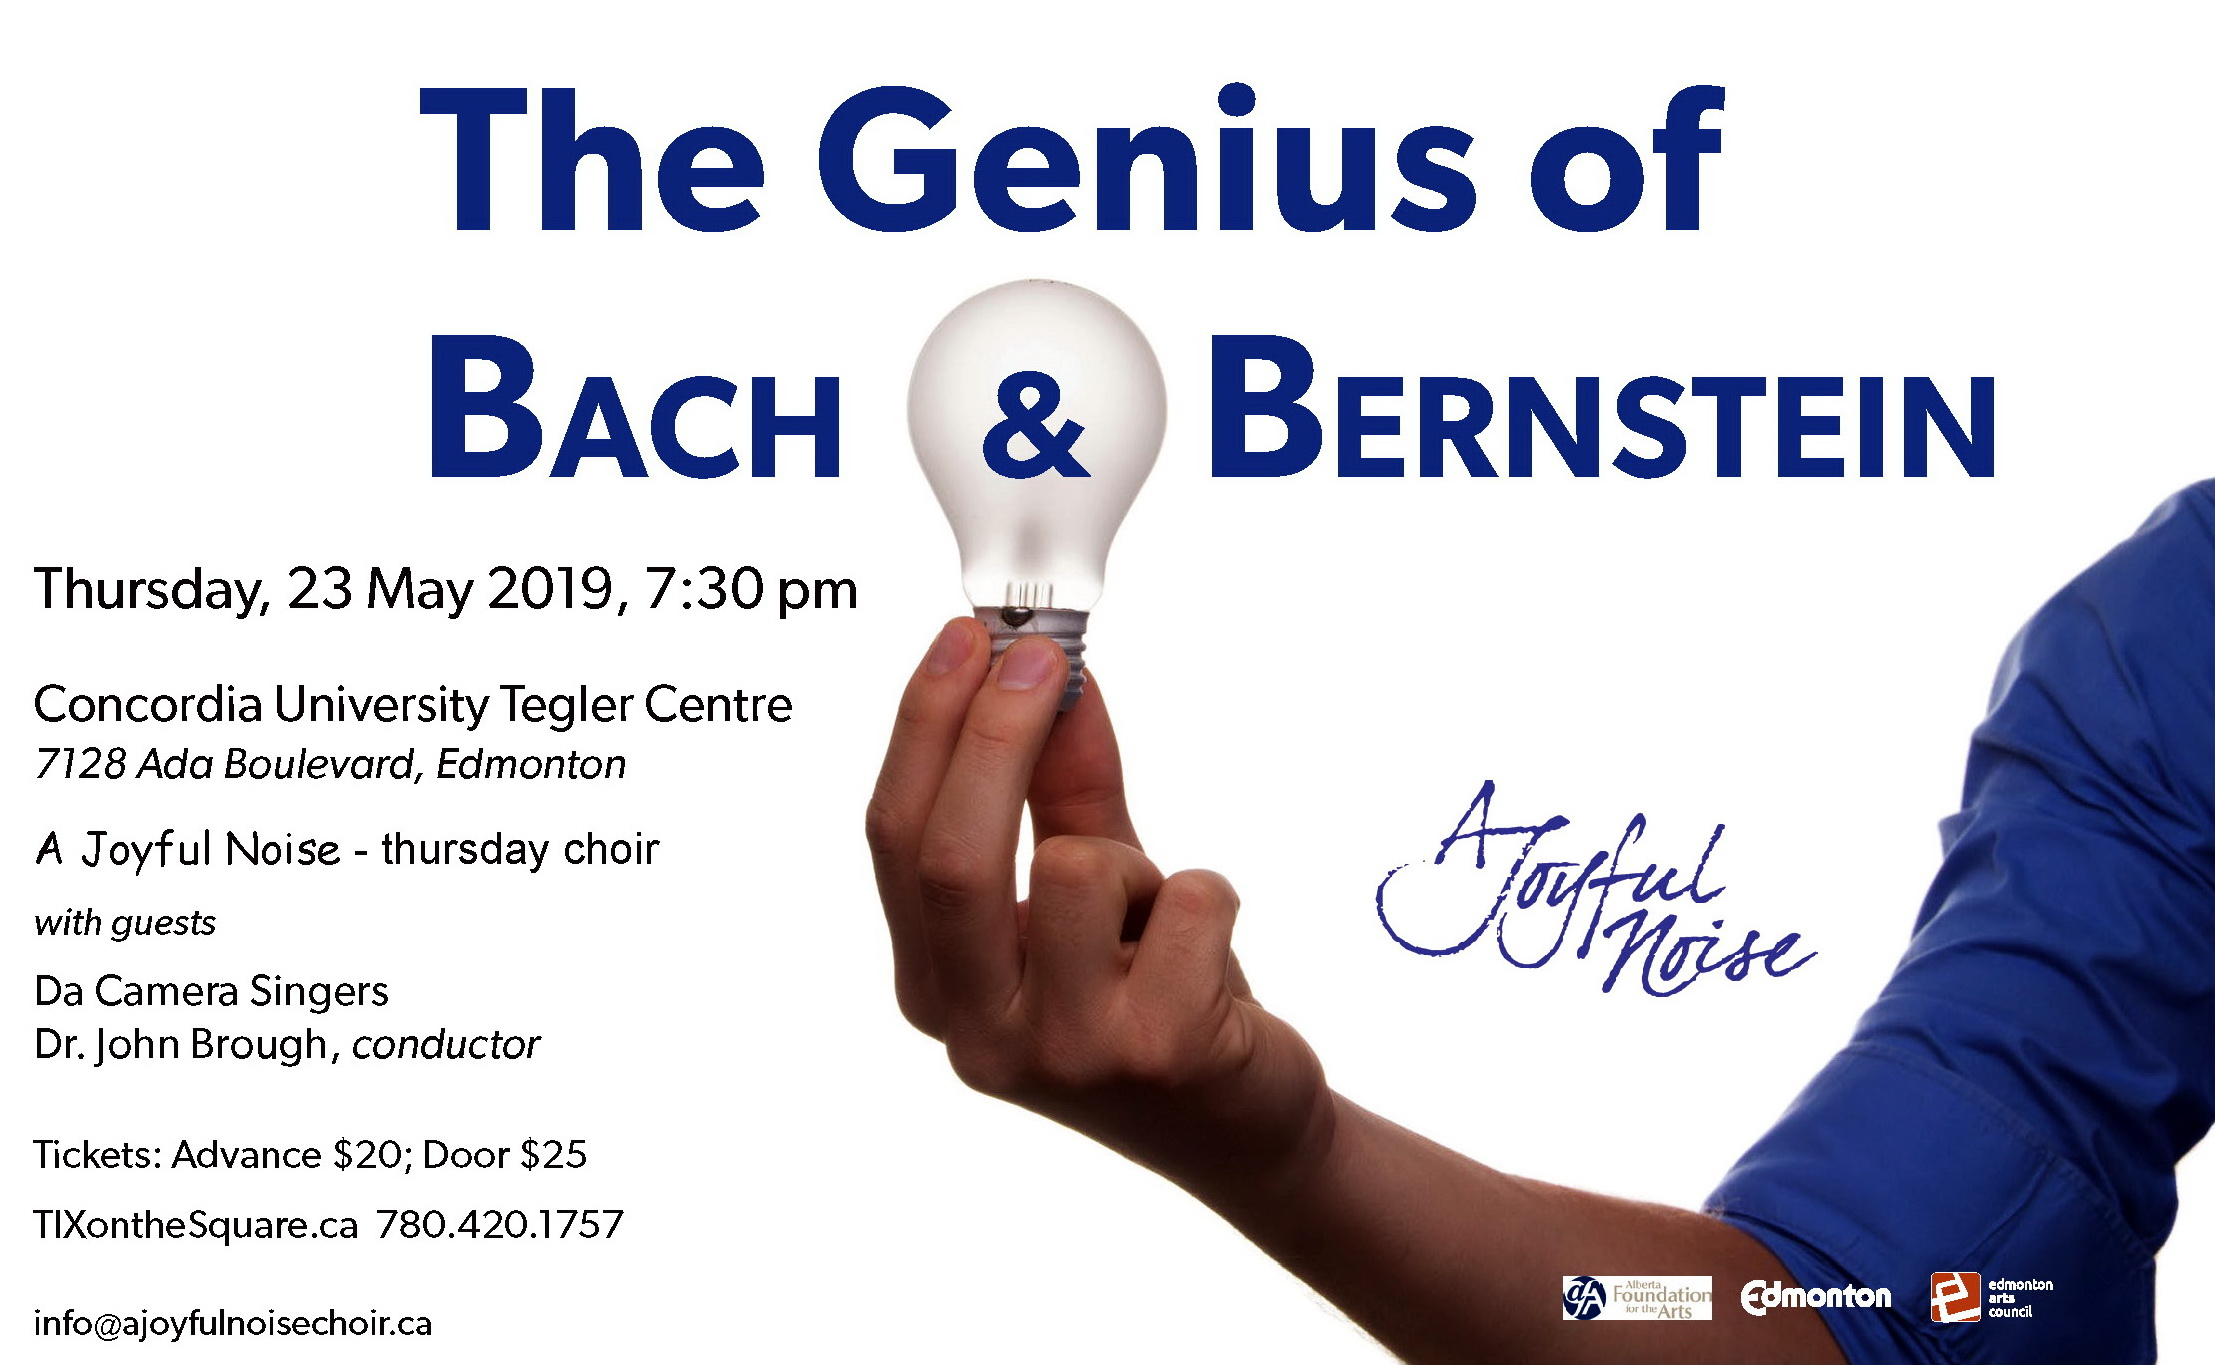 AJN 2019-05-23 Bach & Bernstein POSTER v3 5.5 x 8.5